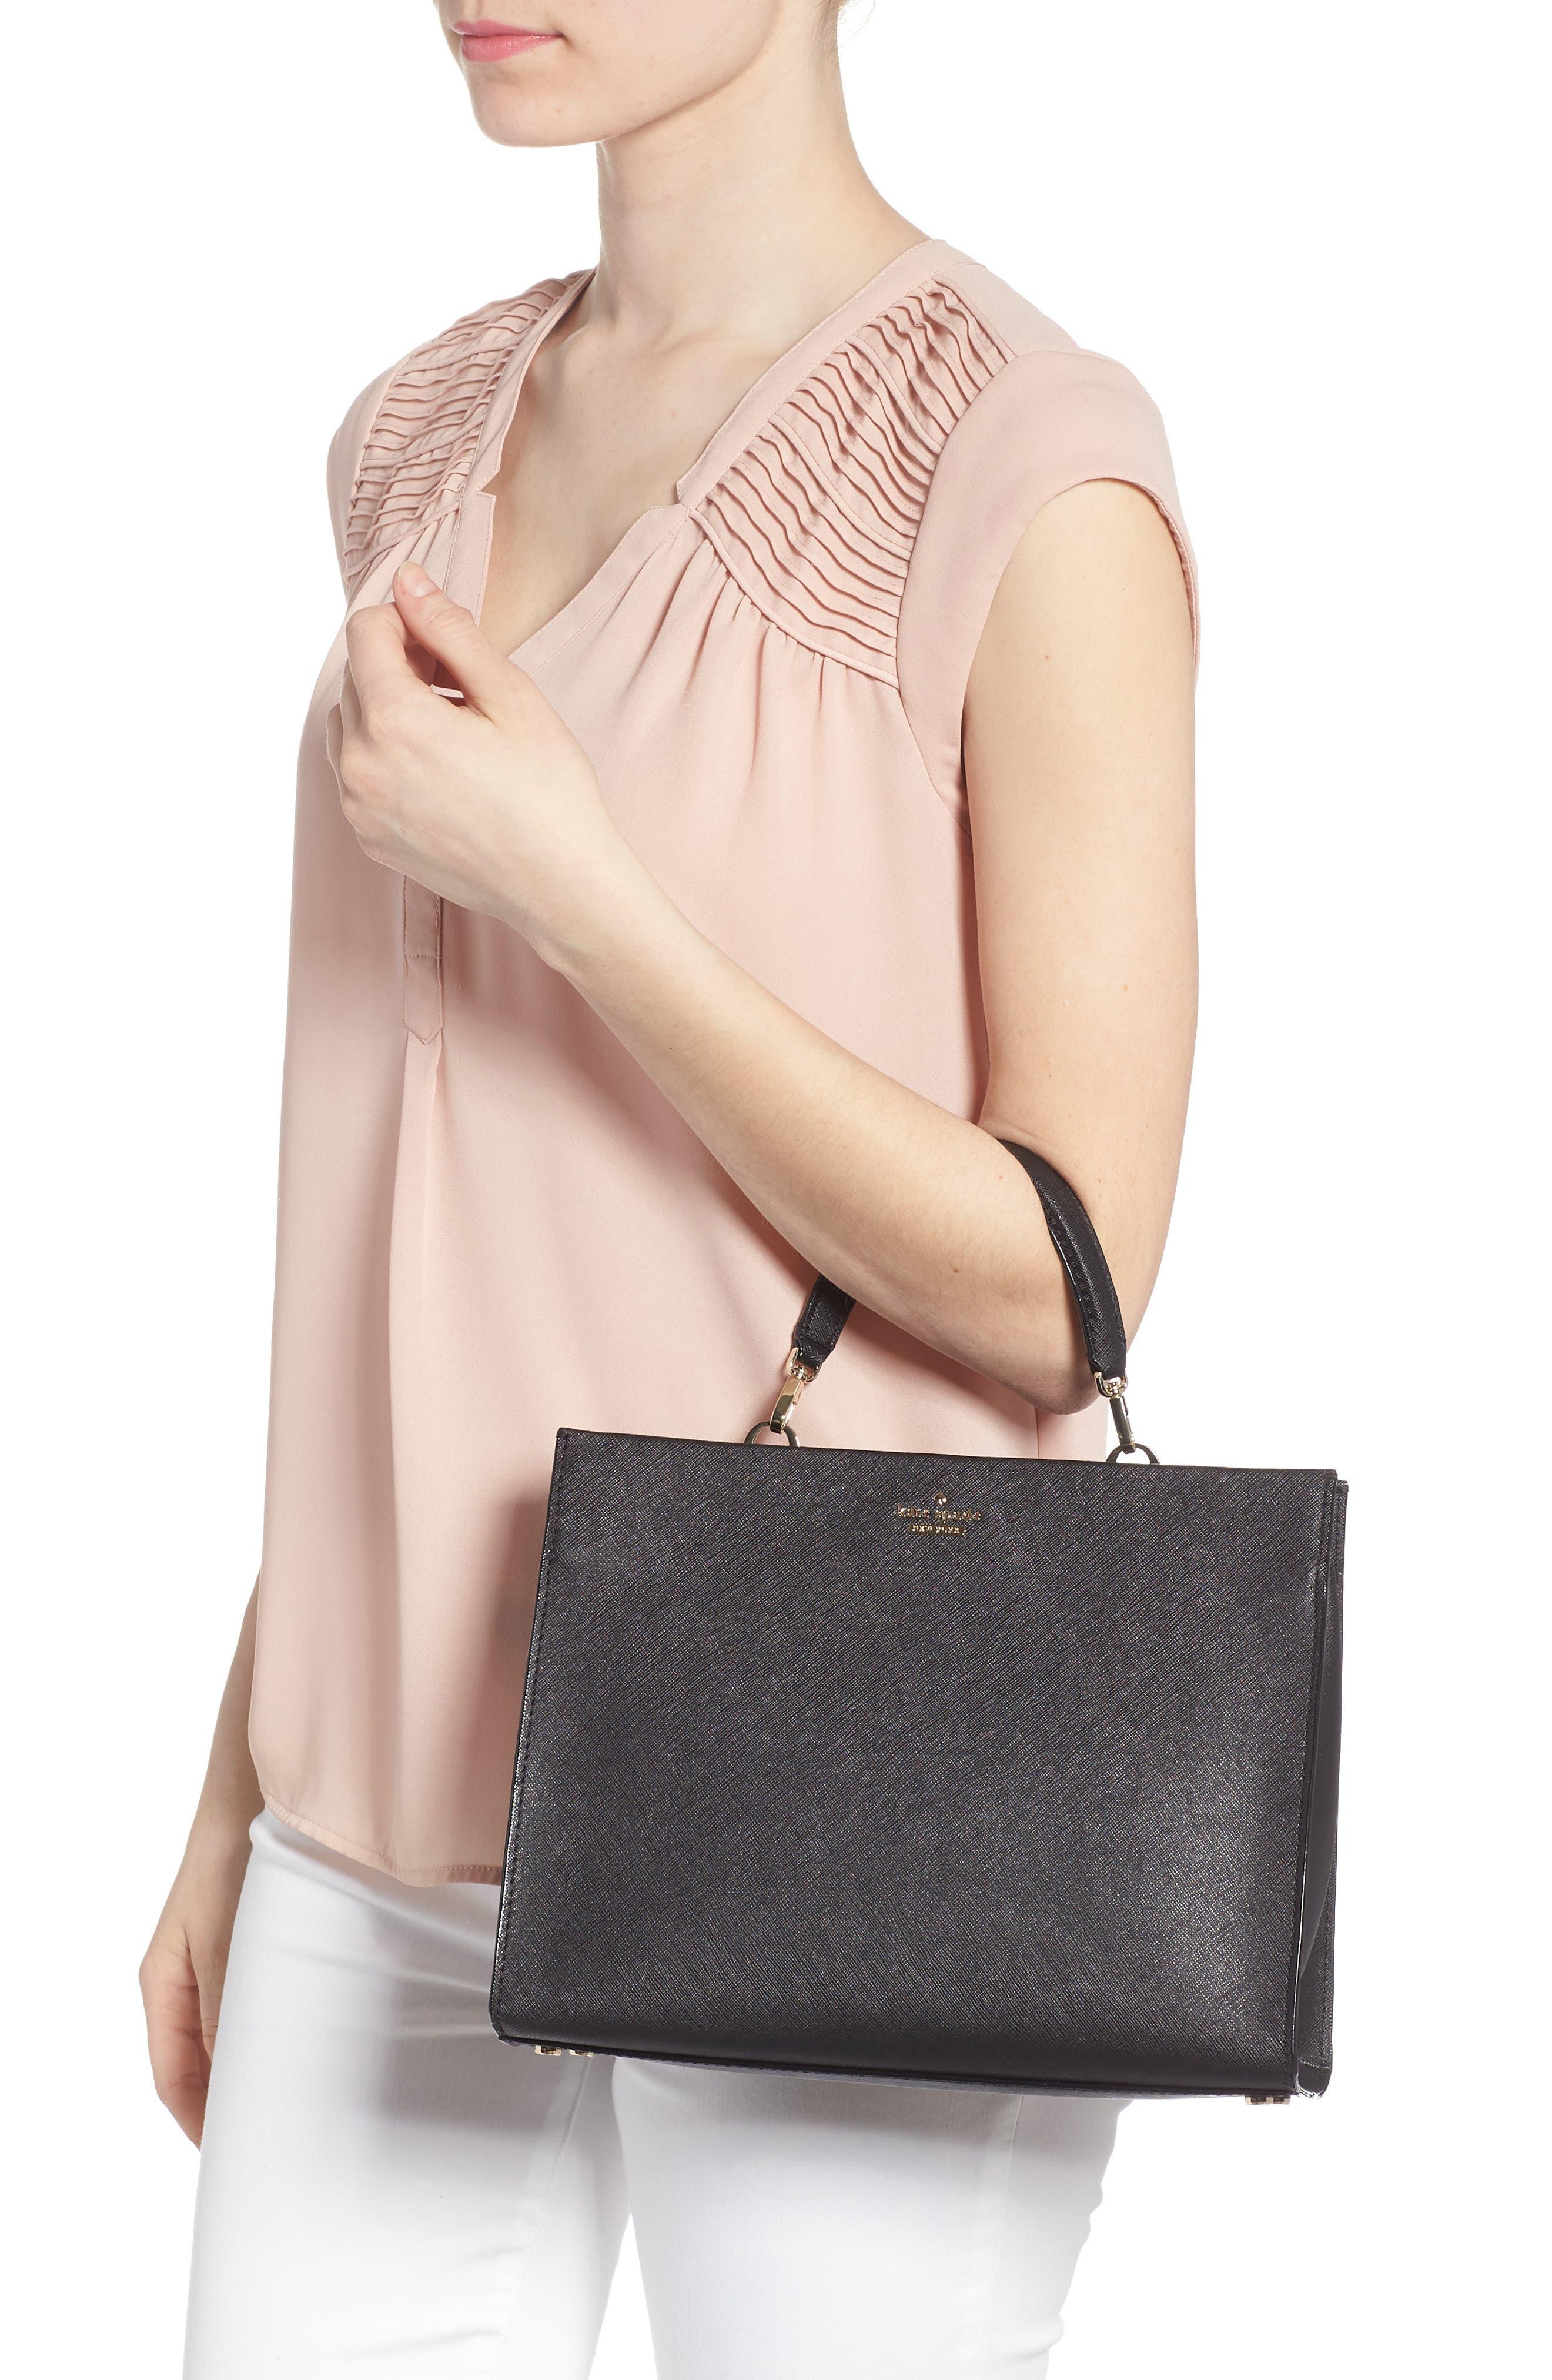 cameron street - sara leather satchel,                             Alternate thumbnail 2, color,                             001